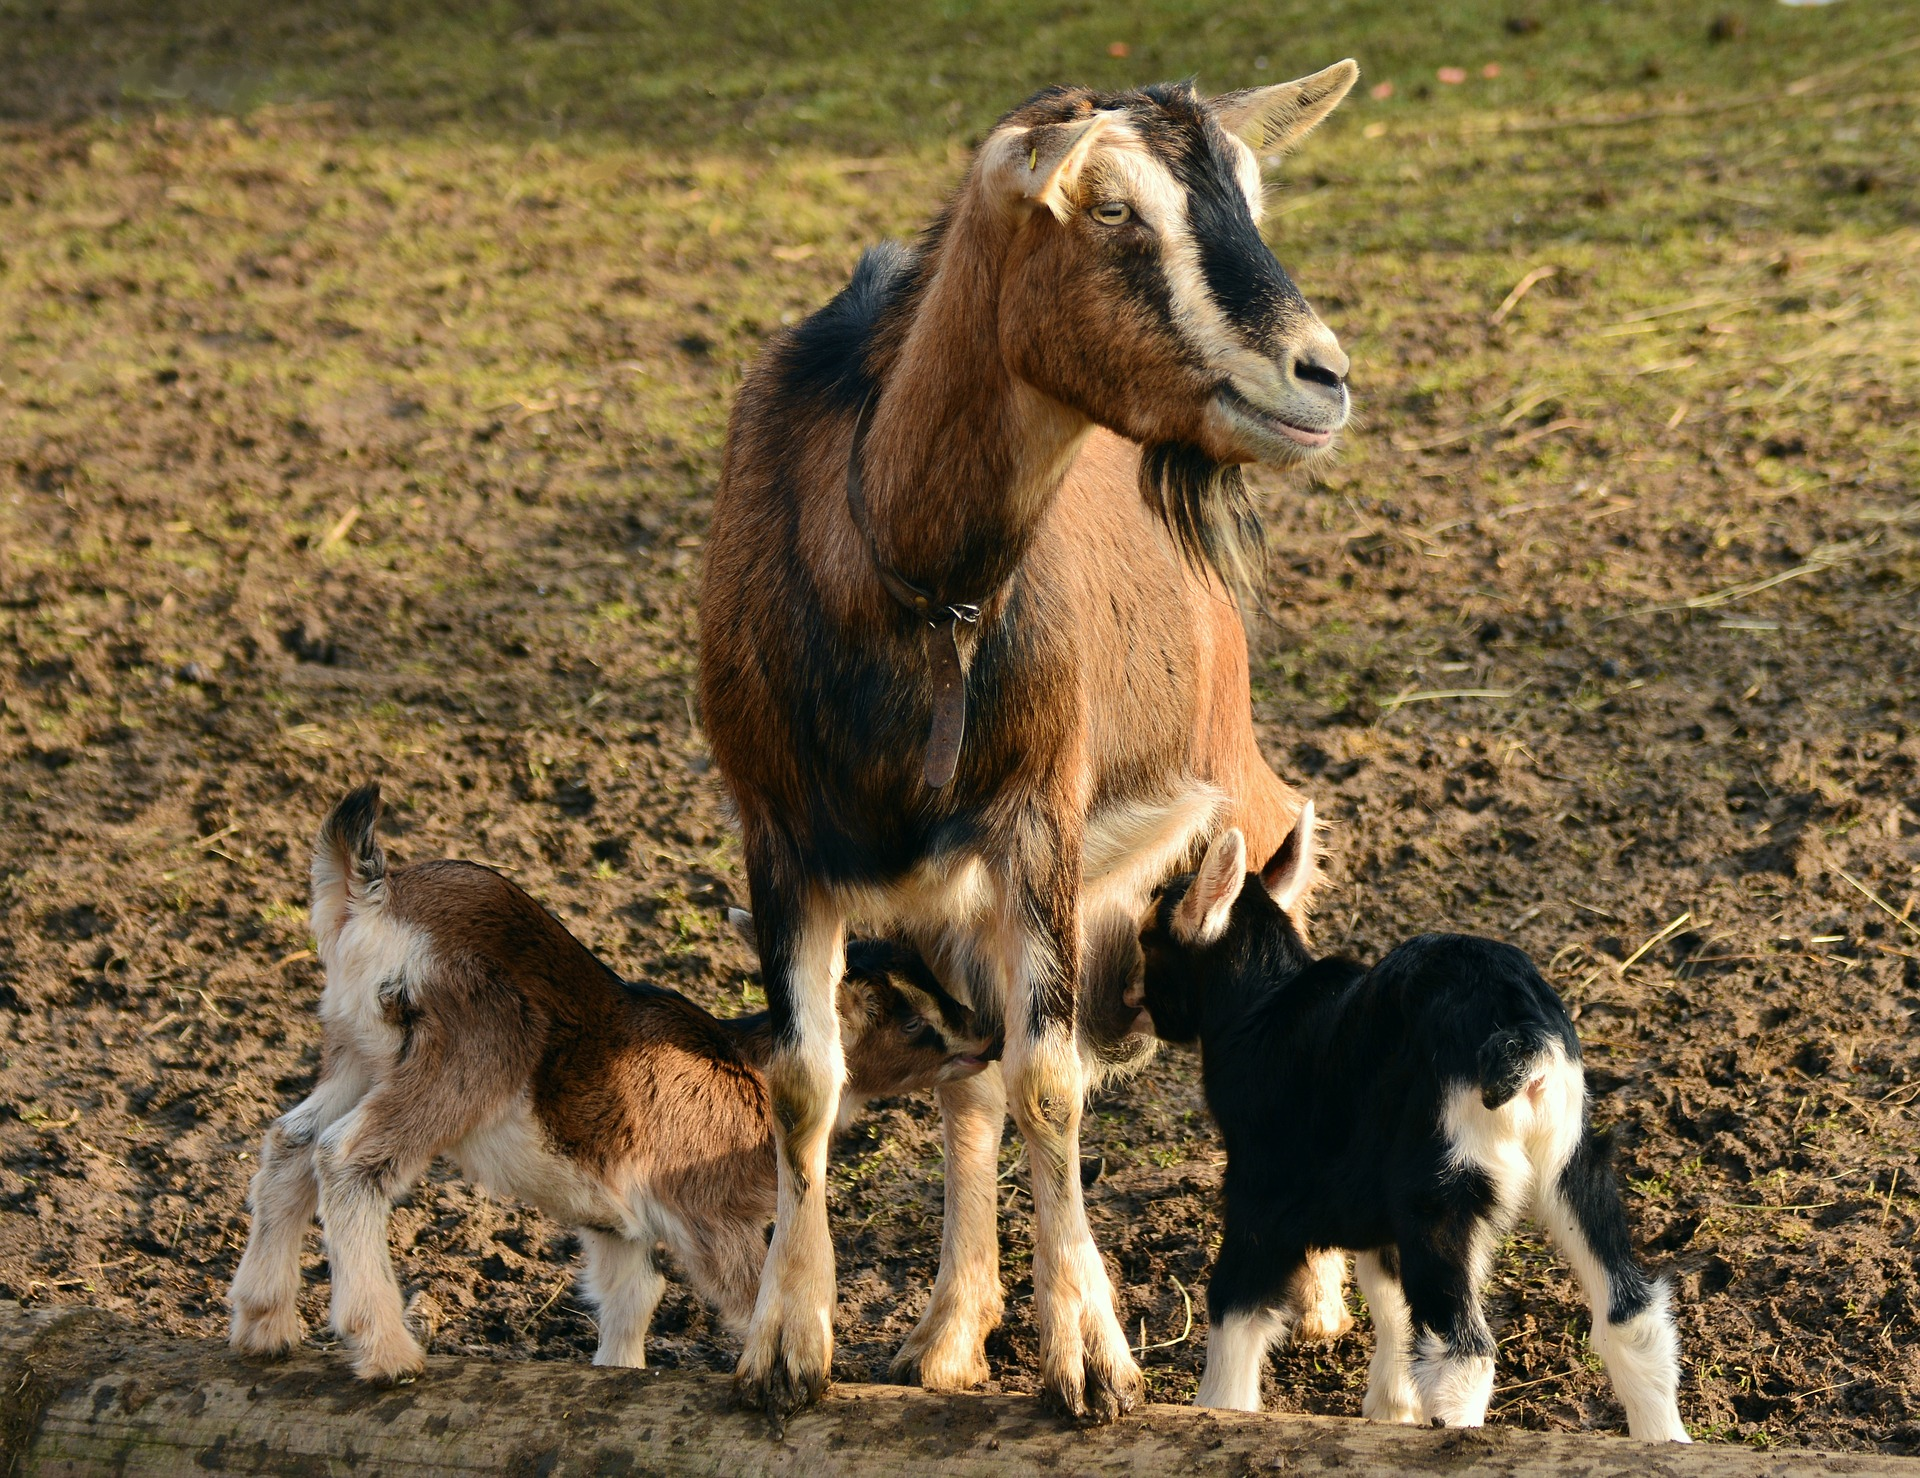 goats-2052731_1920